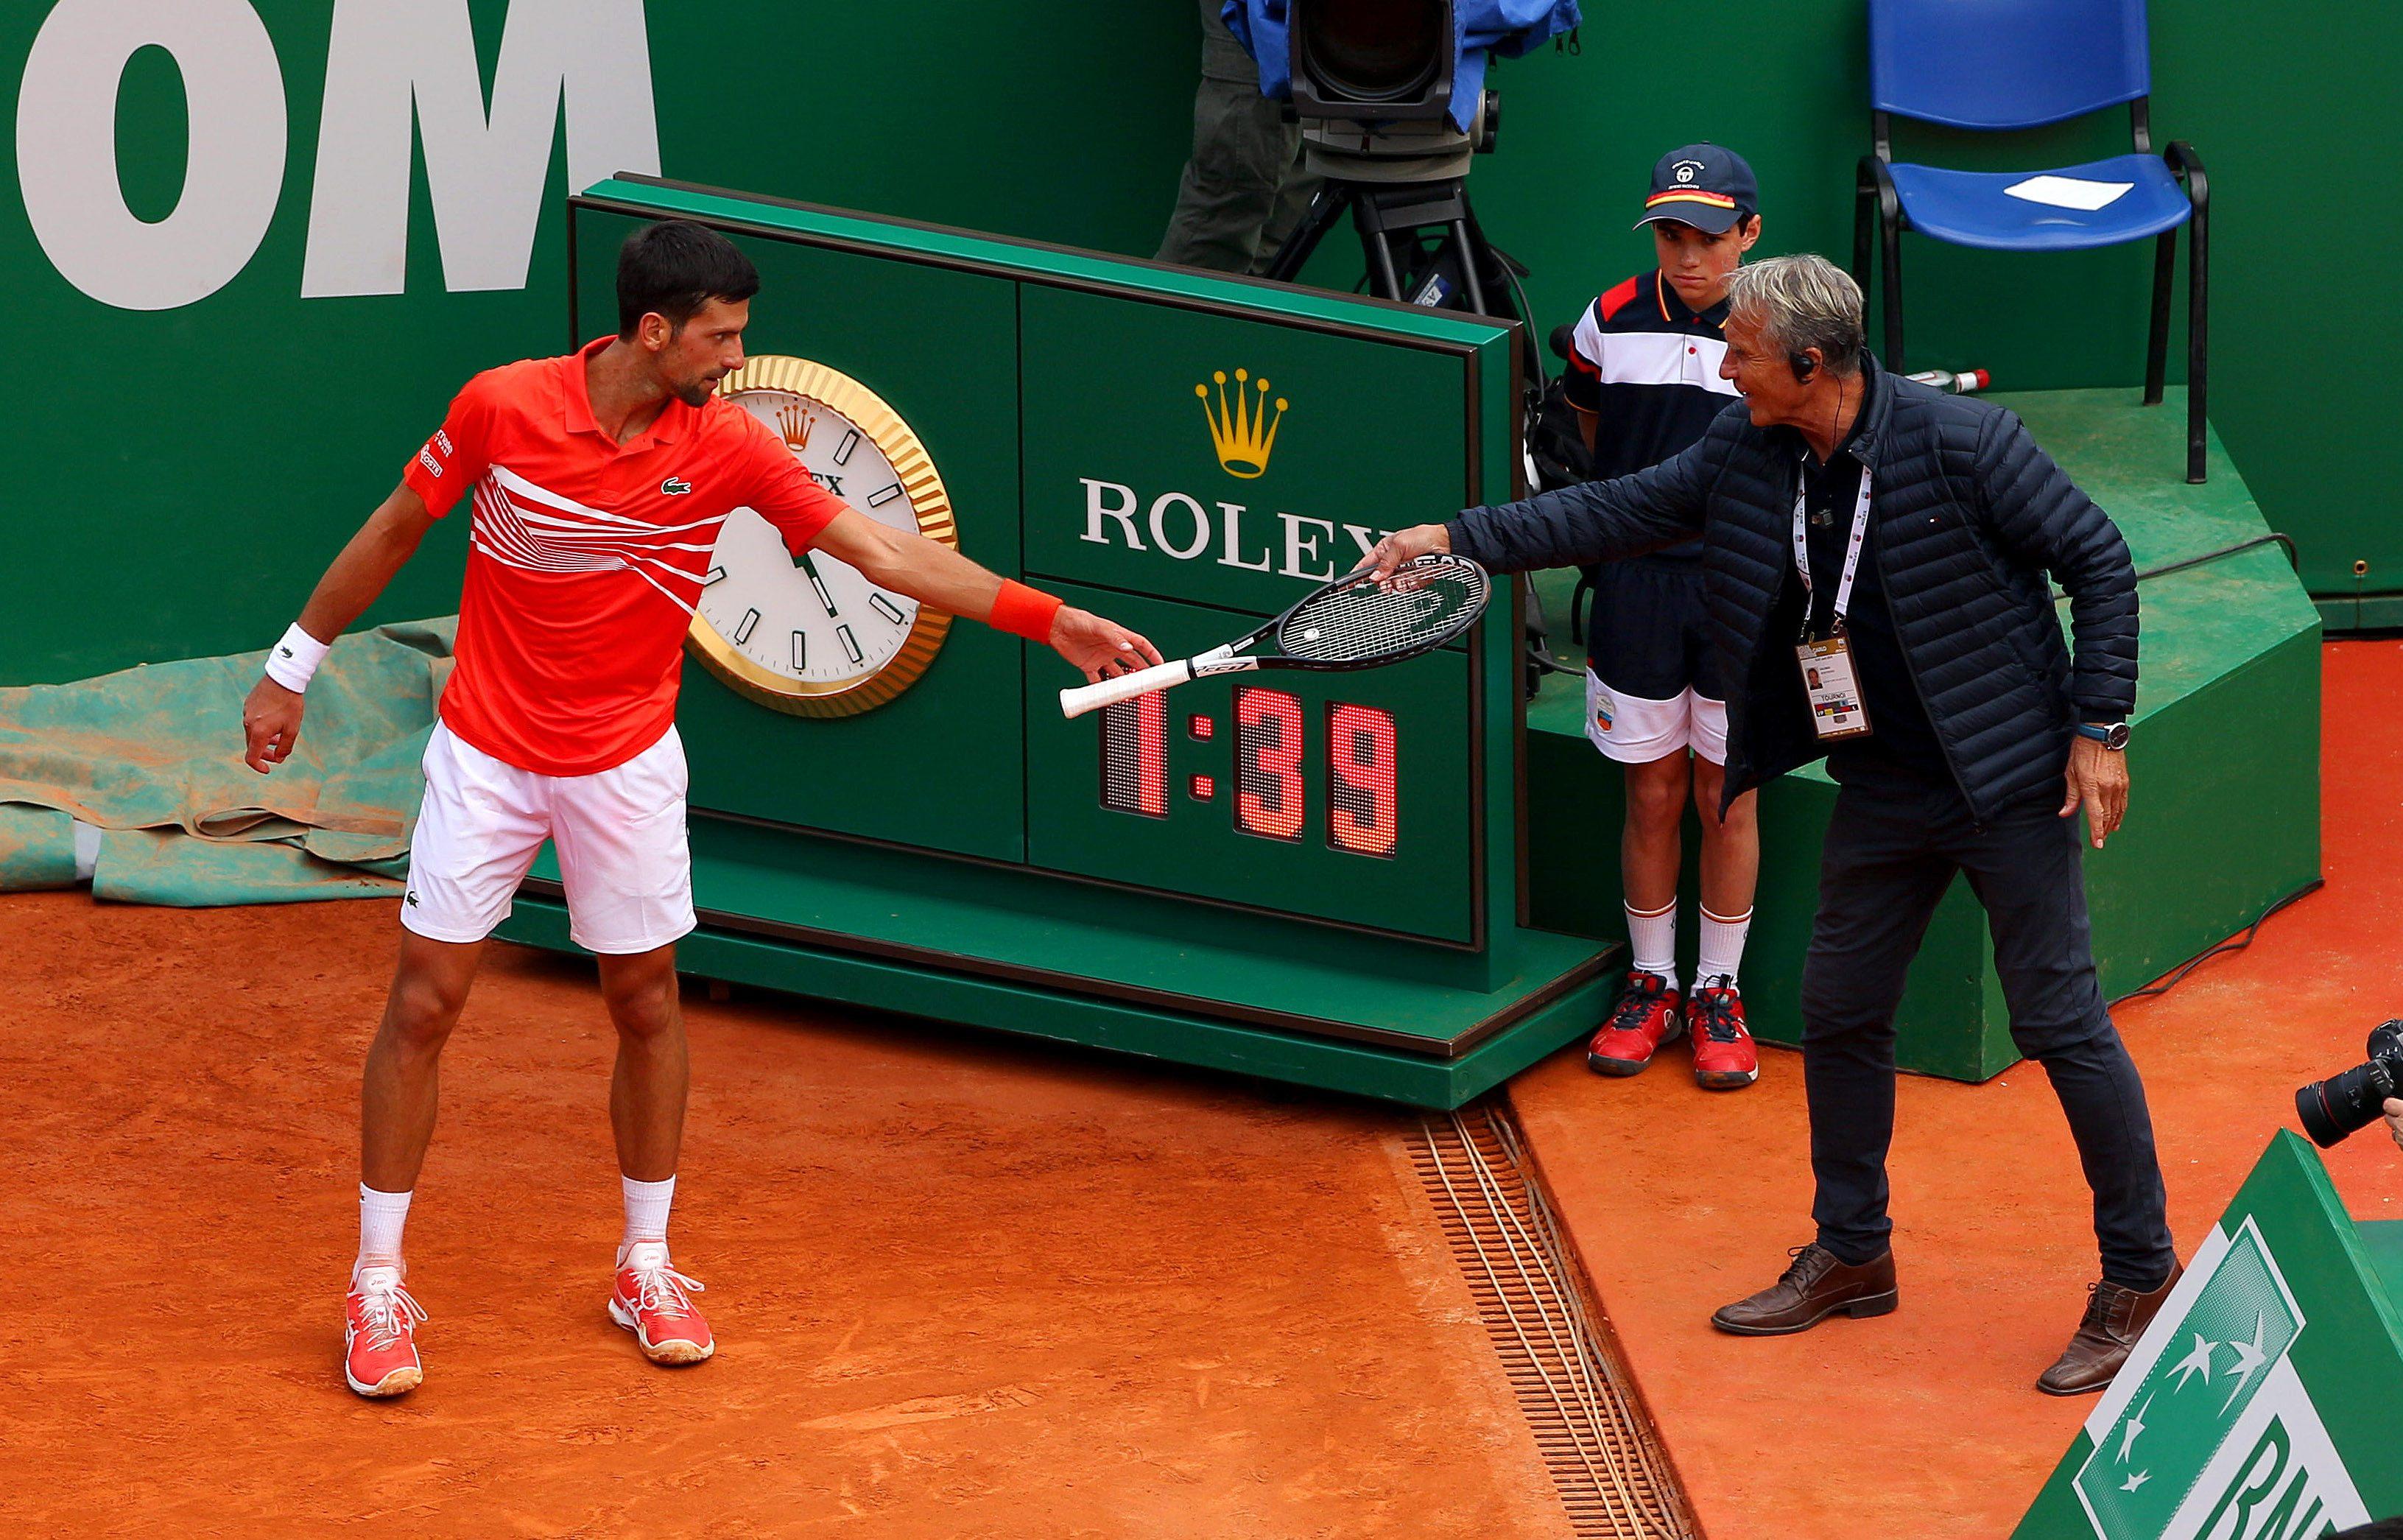 Djokovic is handed his racket back